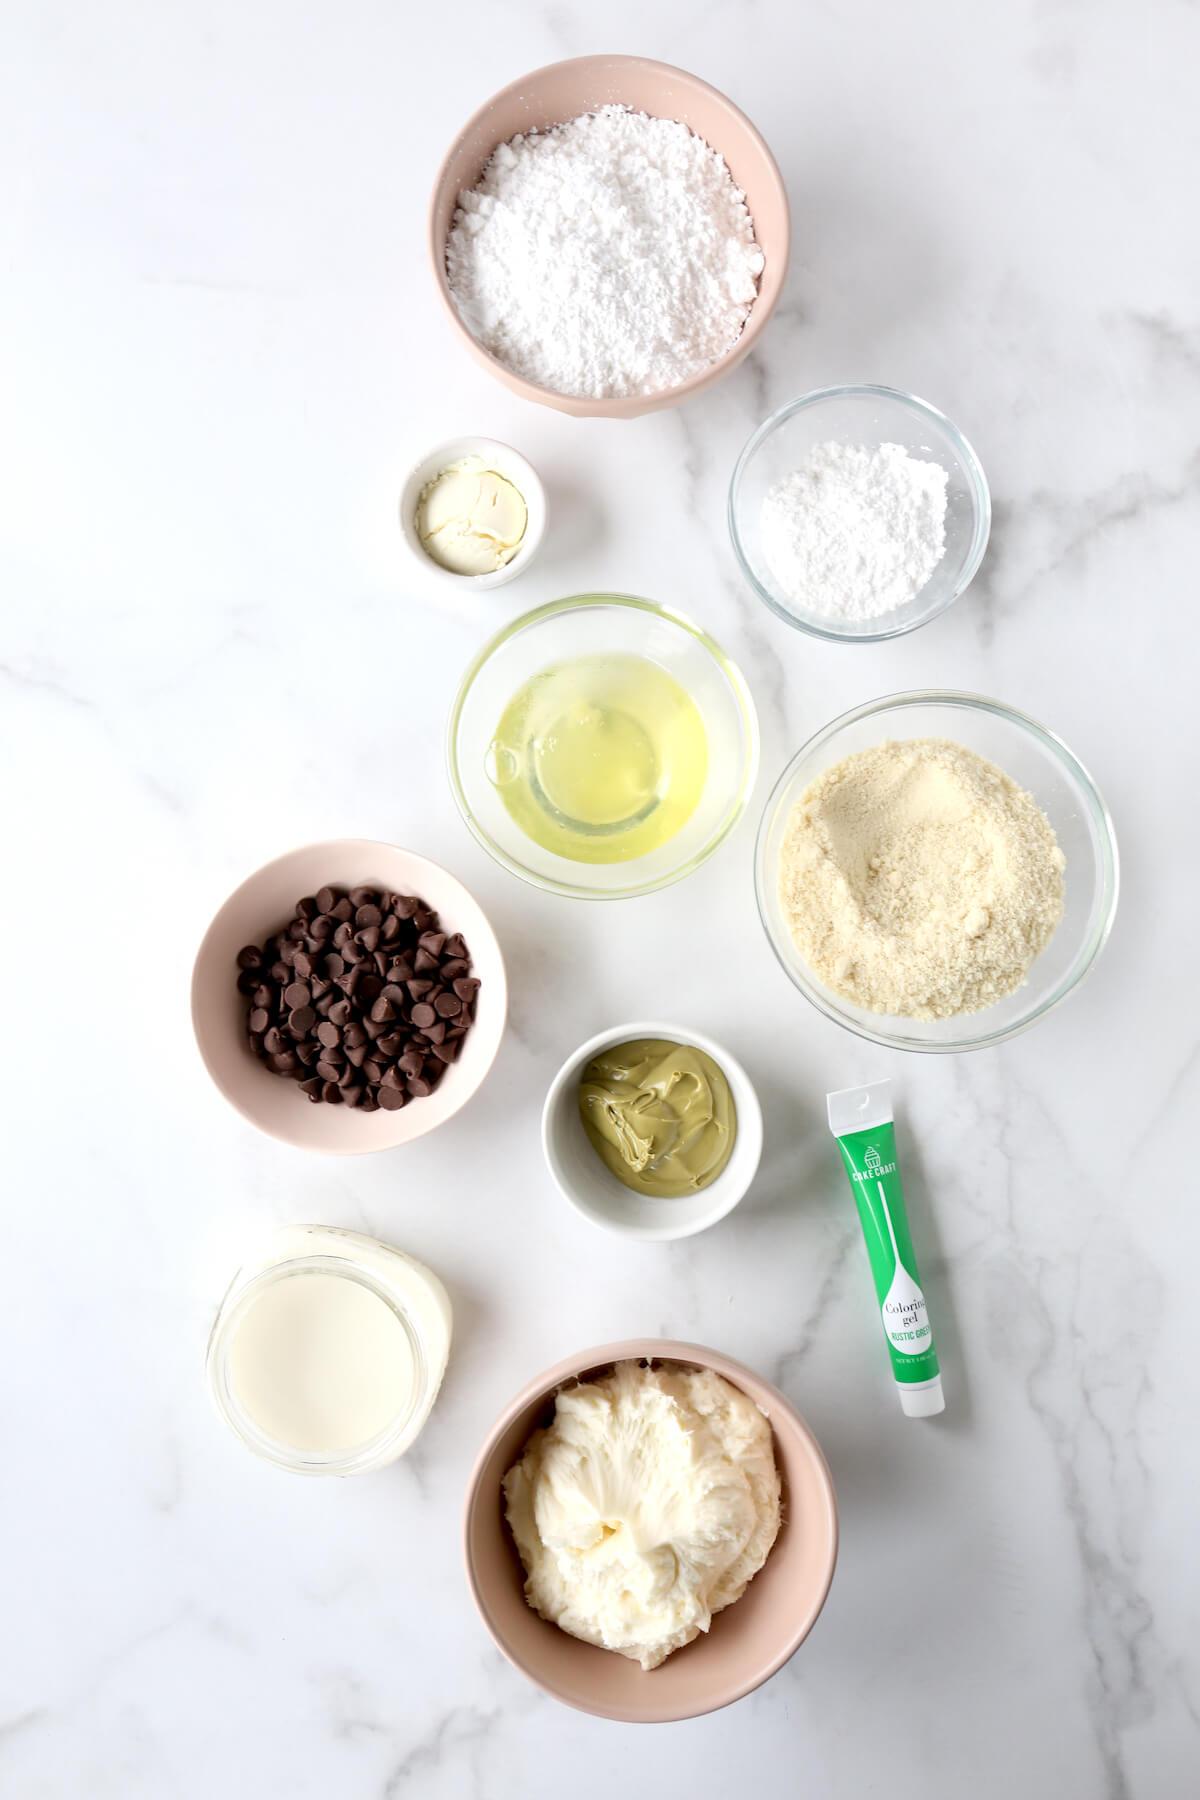 Nine smalls bowls of ingredients prepped to make macarons.